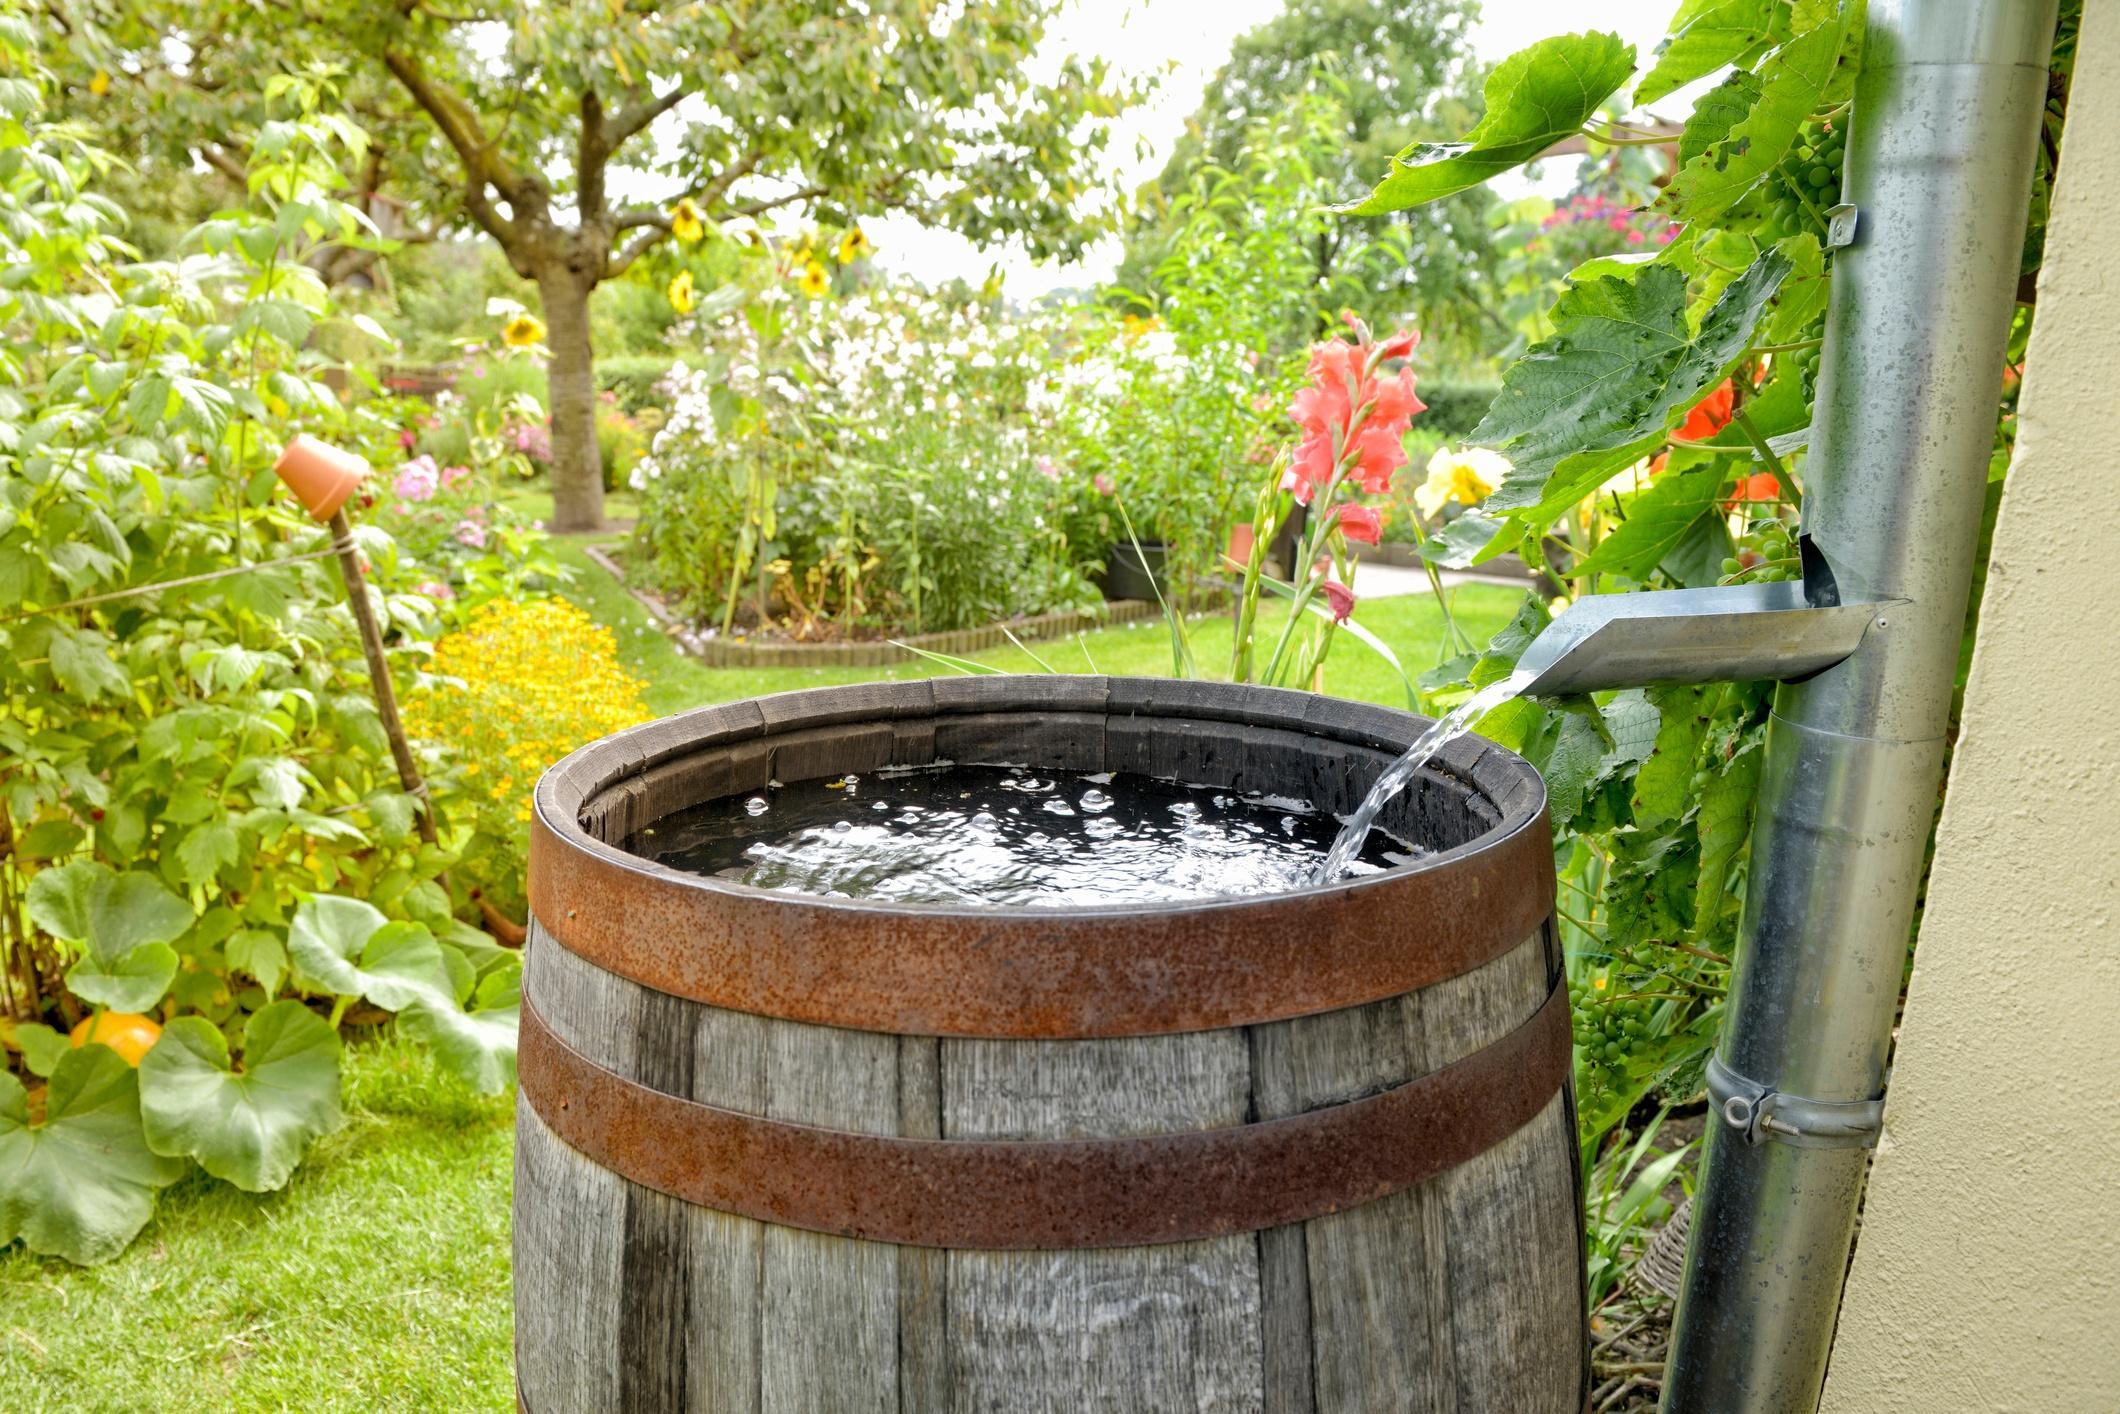 rain-water-conservation-rain barrel.jpg